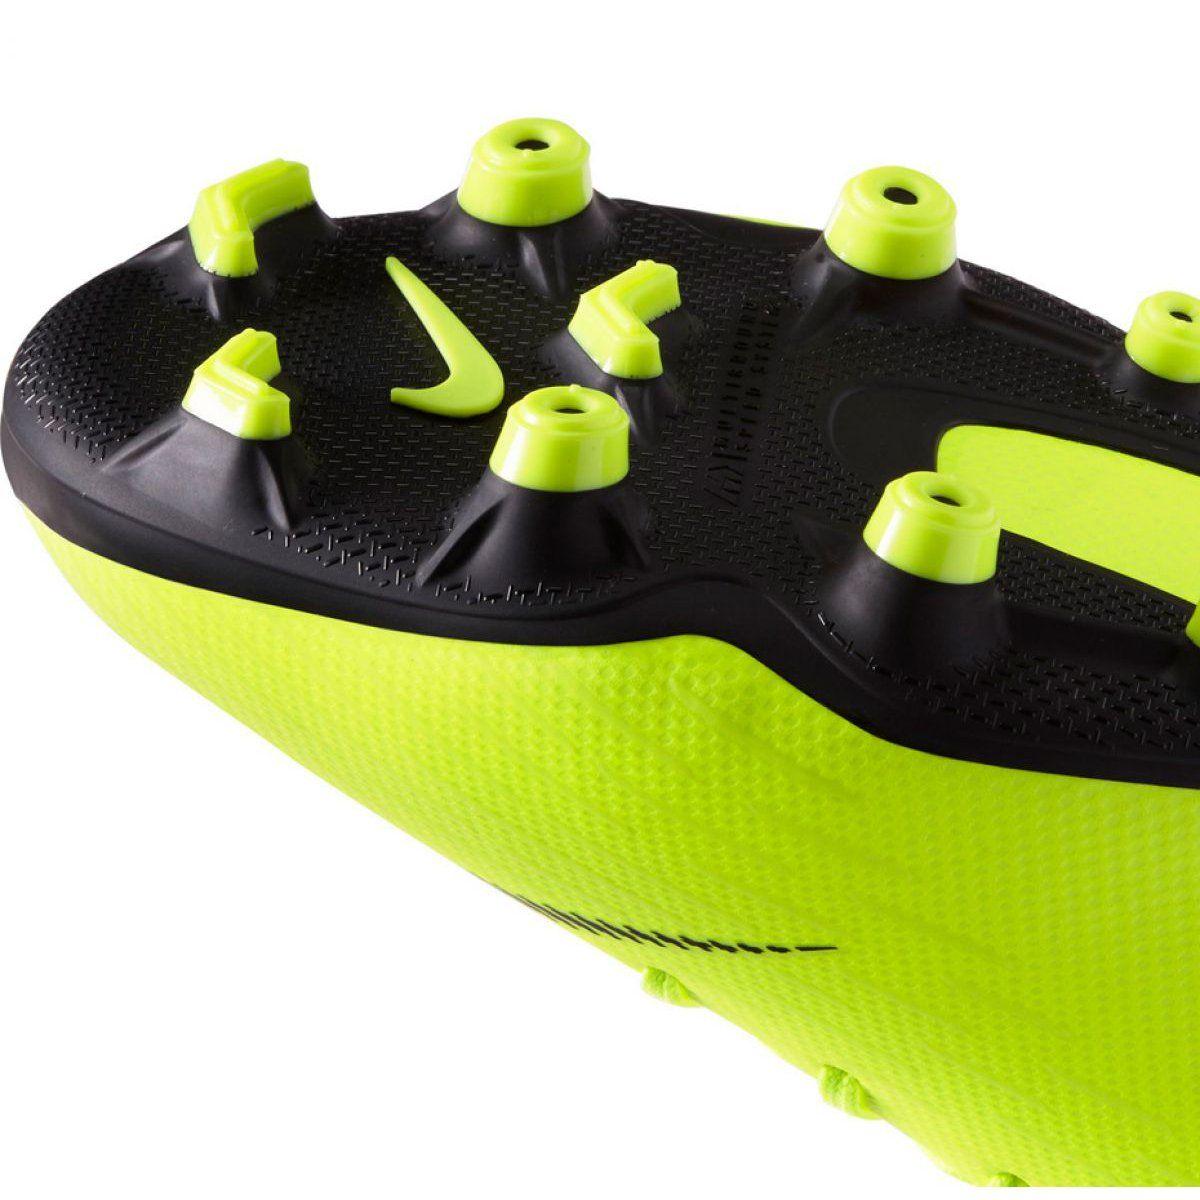 Buty Pilkarskie Nike Mercurial Vapor 12 Academy Mg Jr Ah7347 701 Zolte Wielokolorowe Football Shoes Nike Vapor